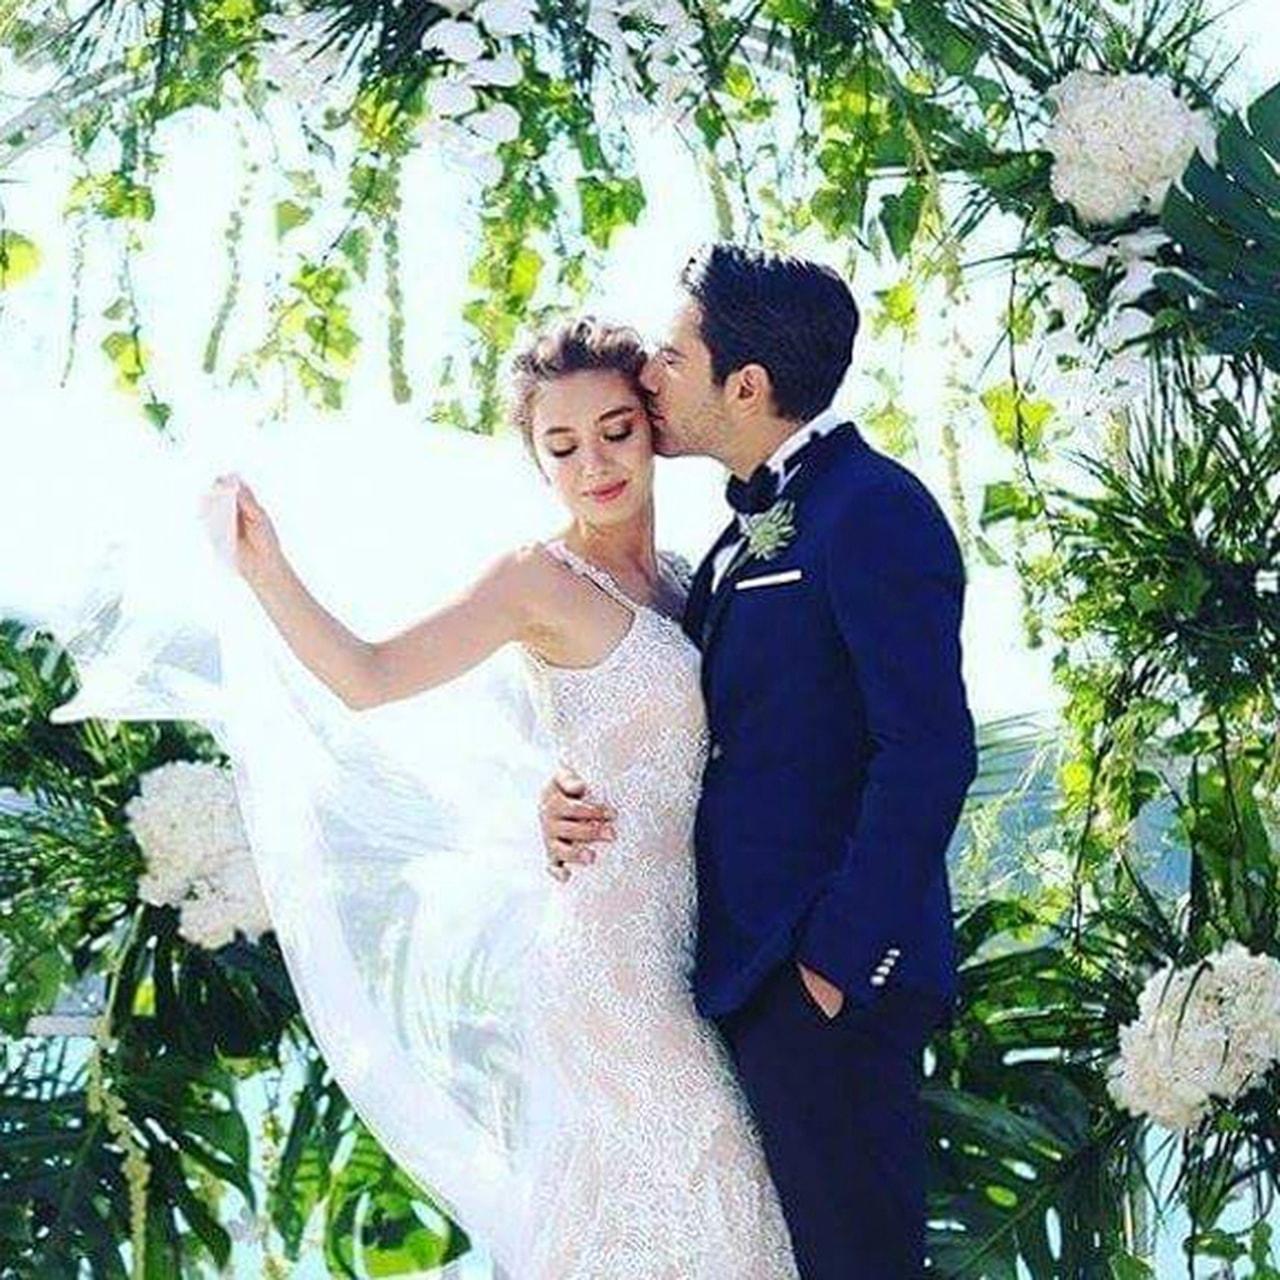 صور احدث صور الزفاف , احدث موديلات فساتين الزفاف